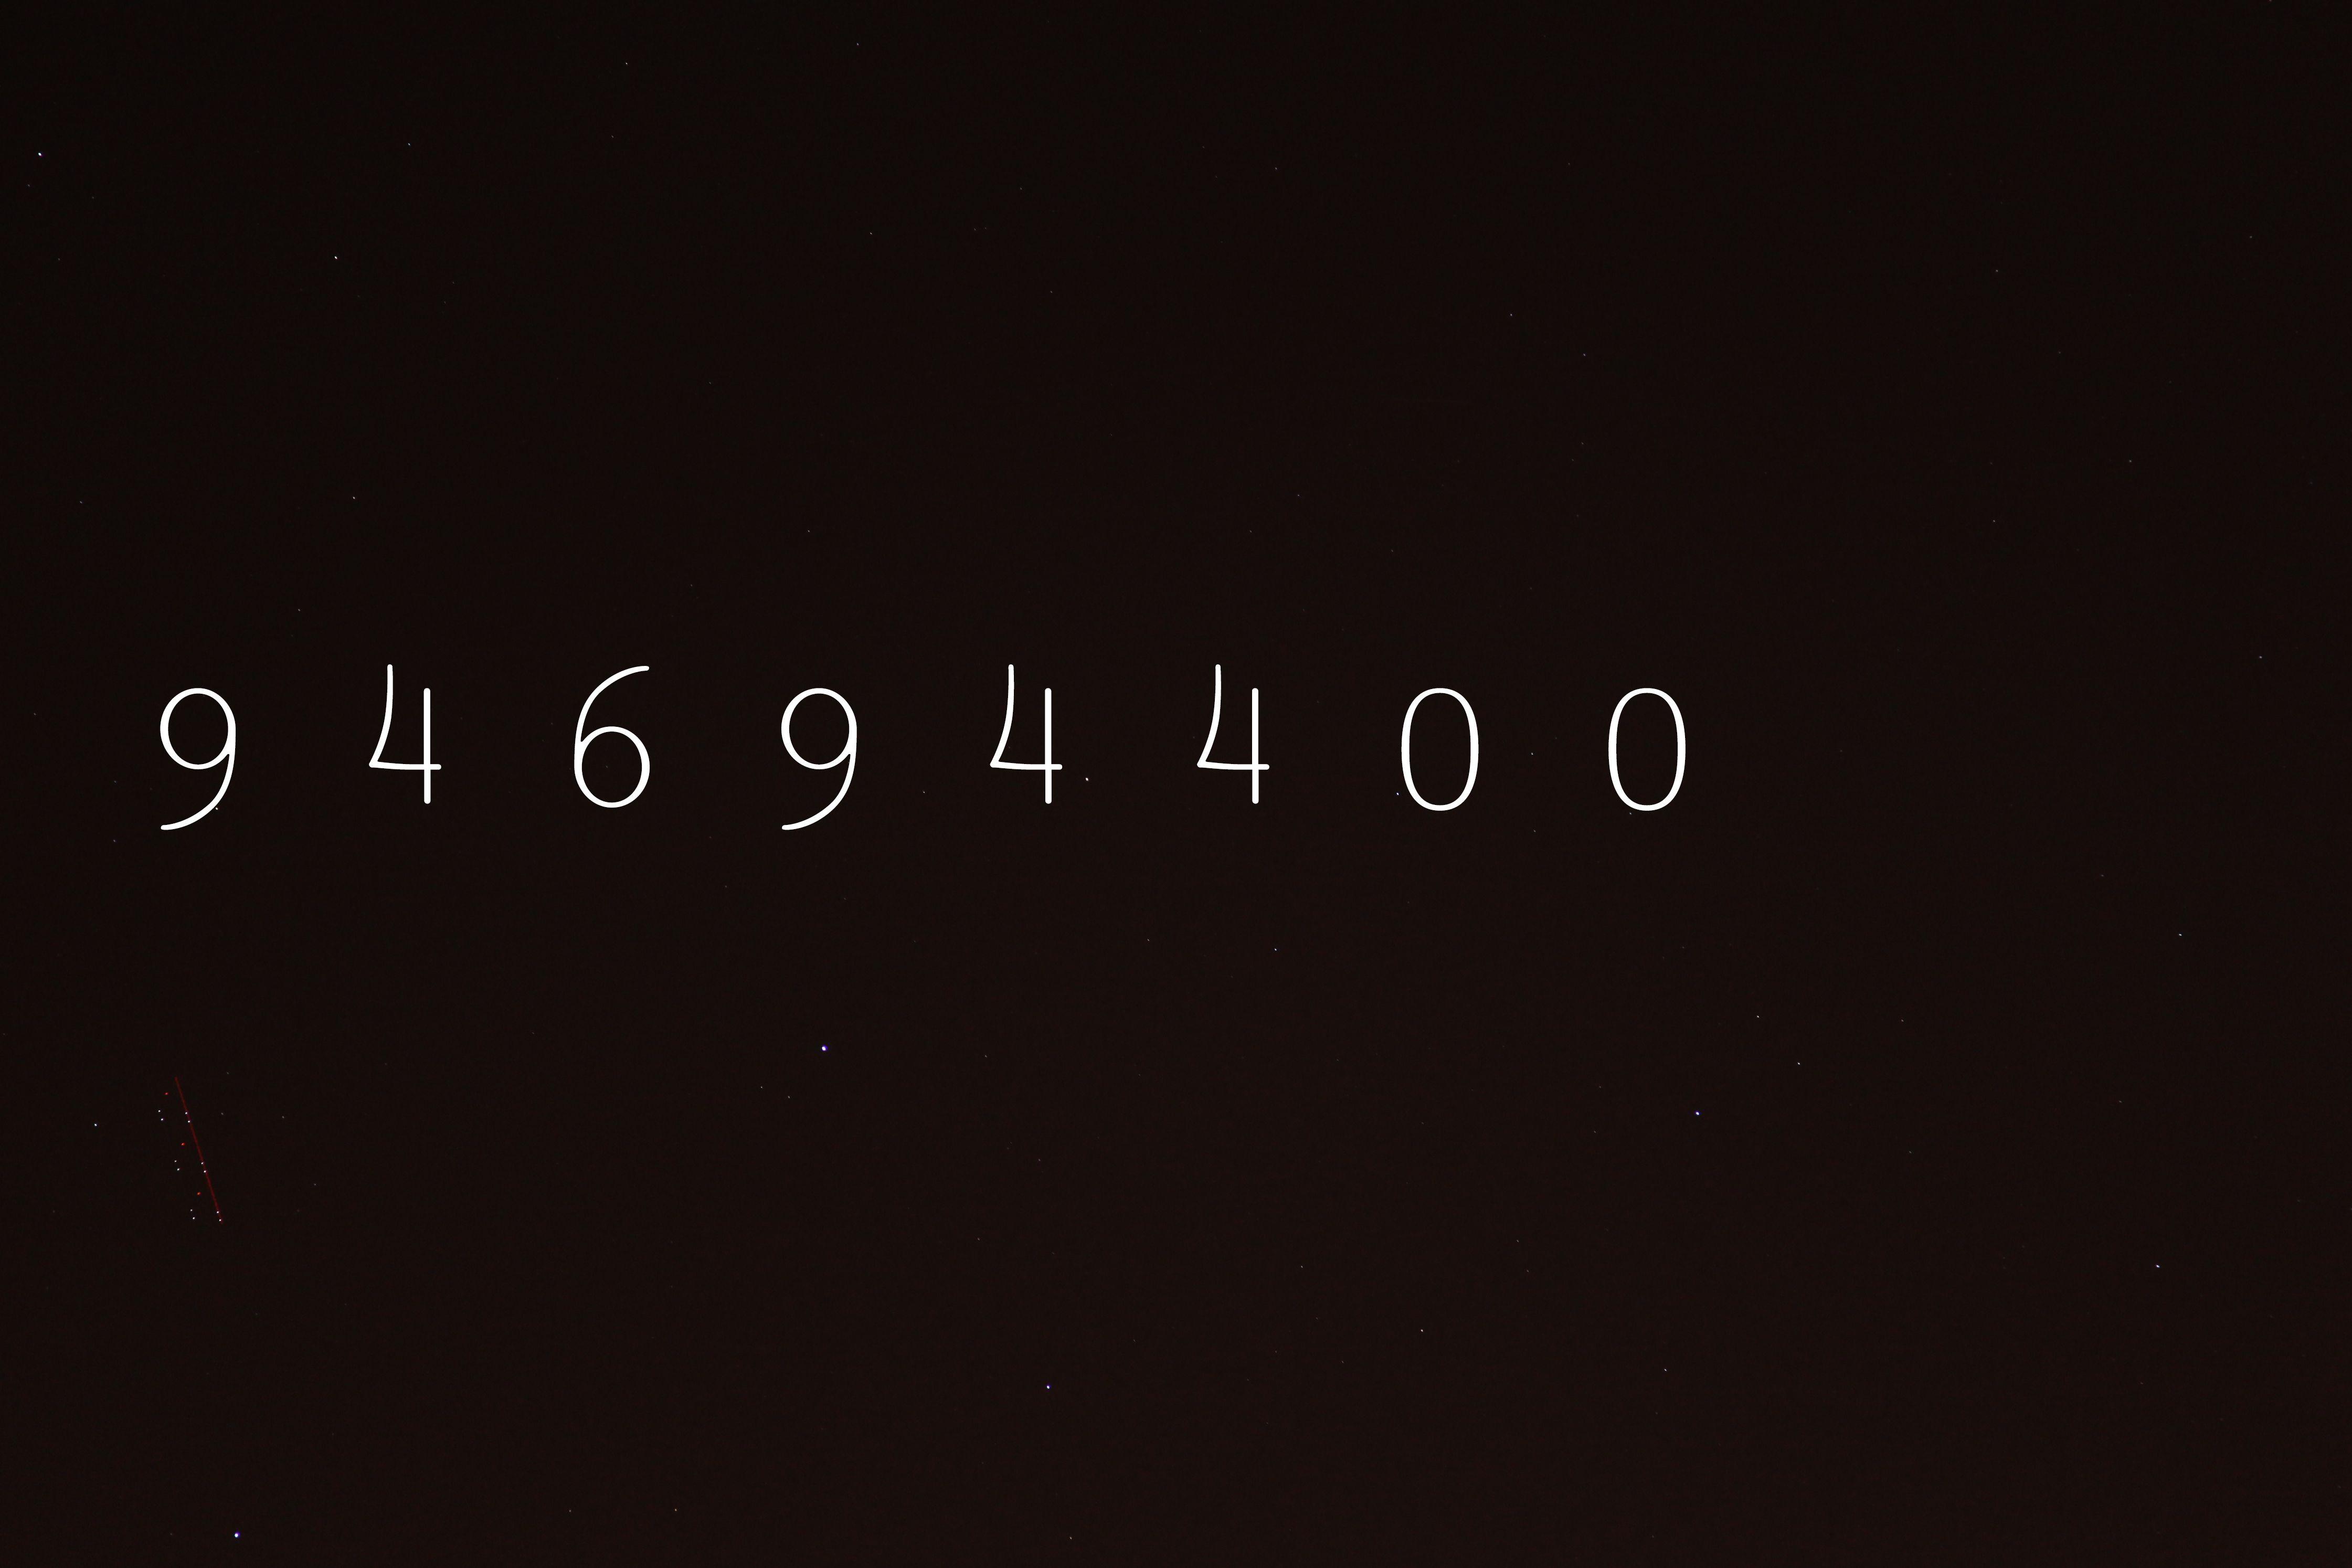 Leap Second, 31 December 1972 - 23:59:60